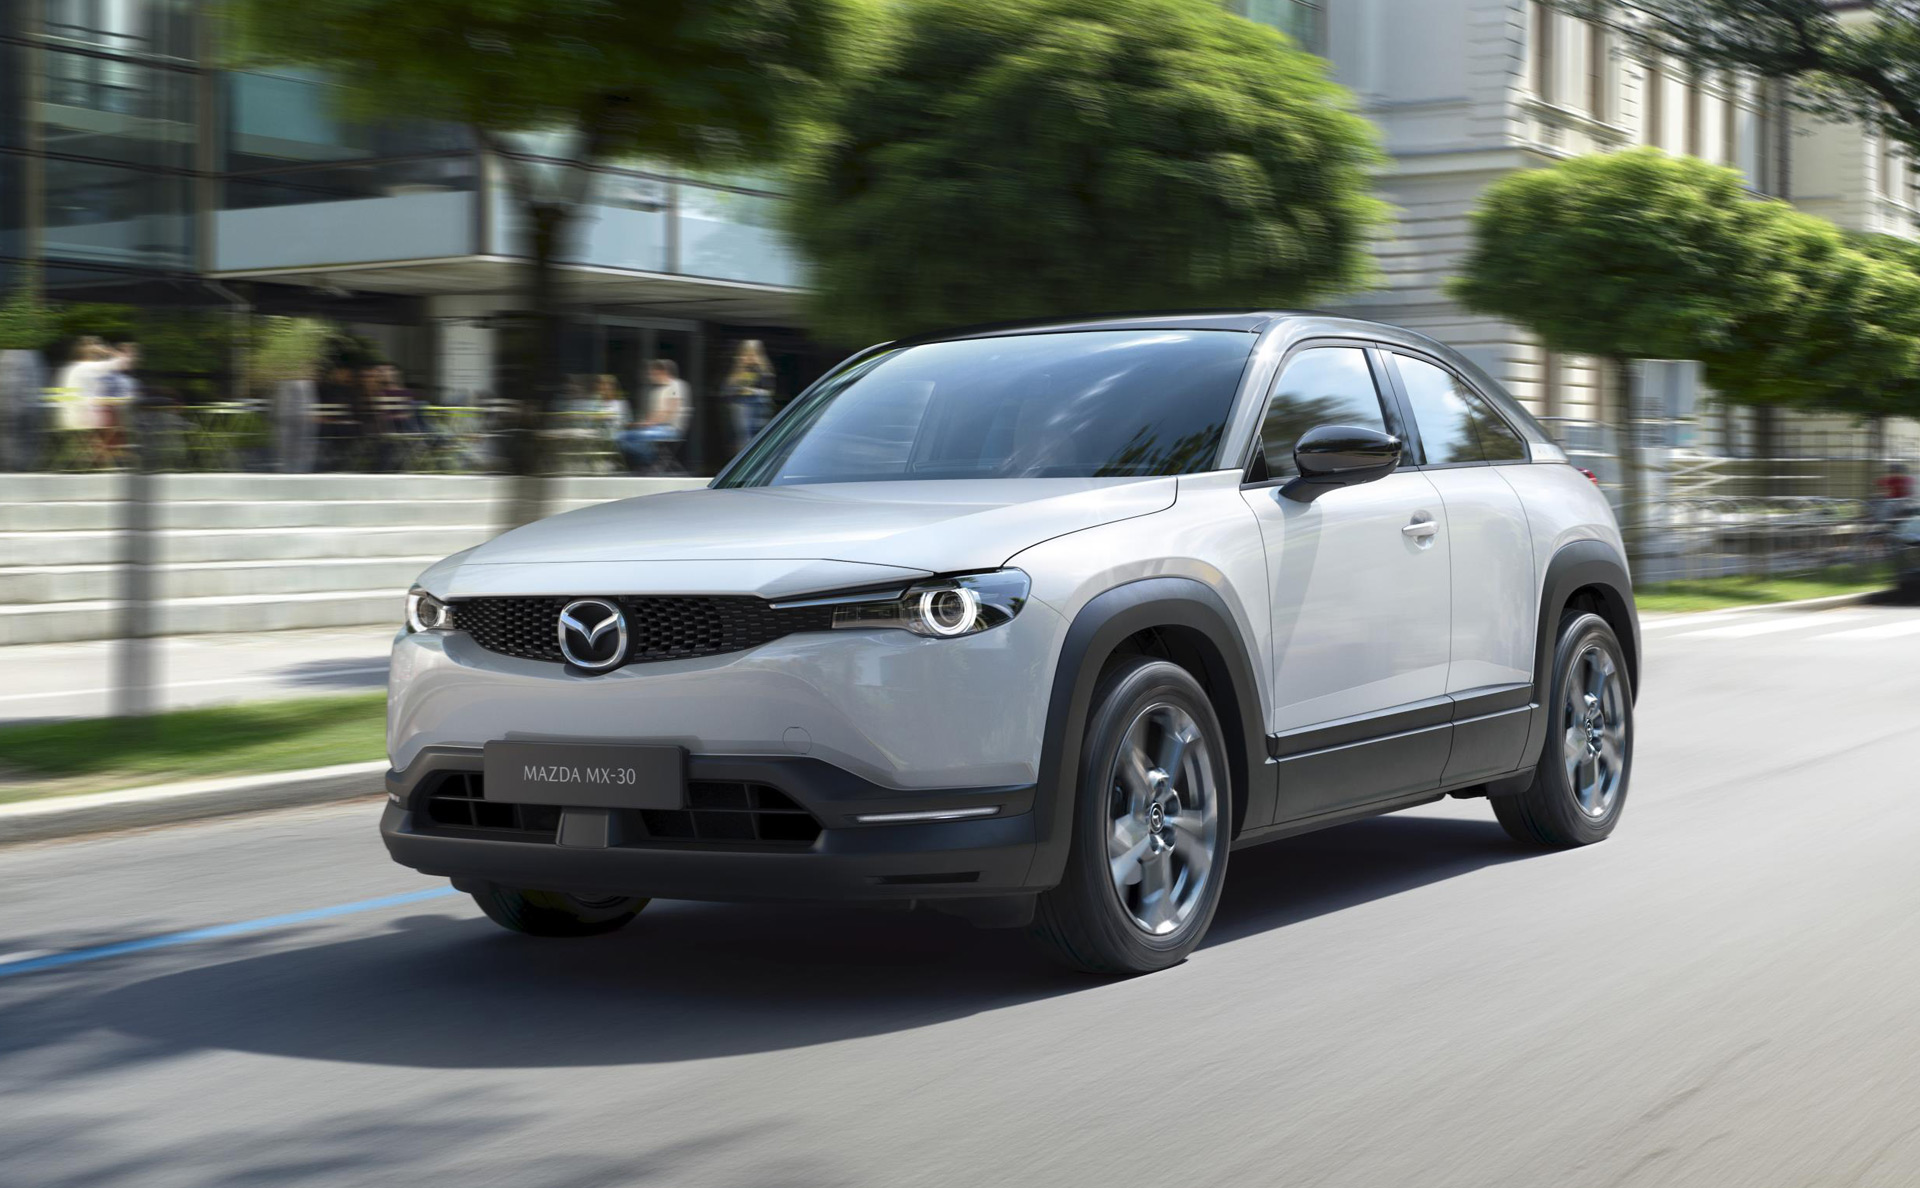 2022 Mazda MX-30 preview: Rotary-ready freak of the future bucks big batteries